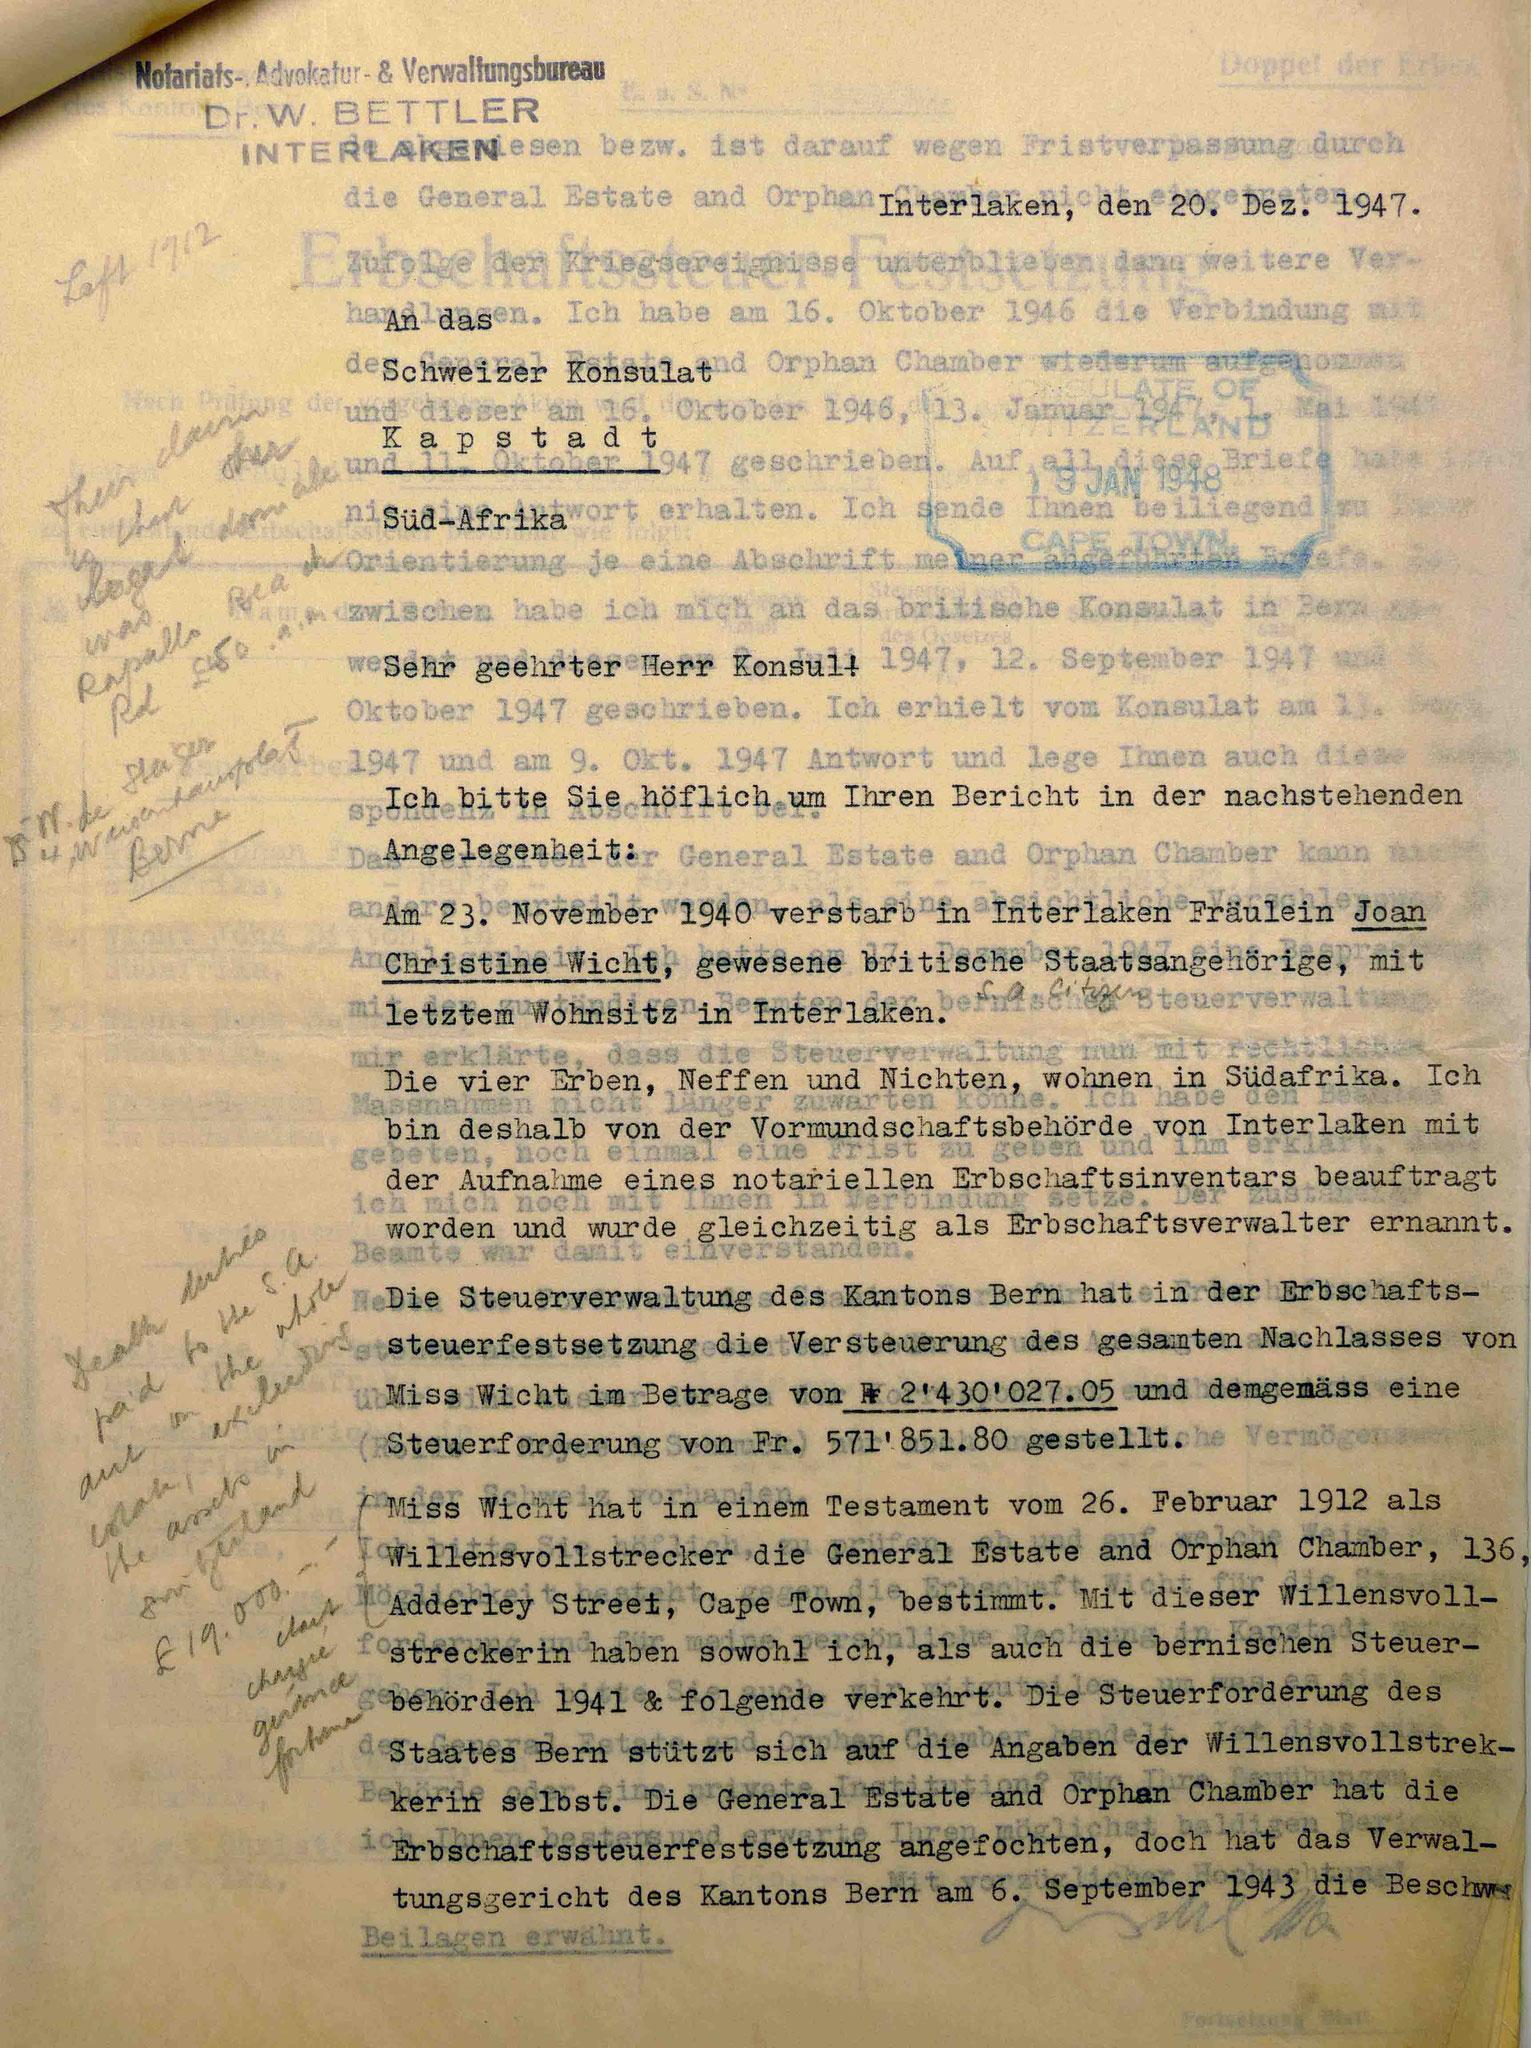 Dokumente aus dem Bundesarchiv Bern